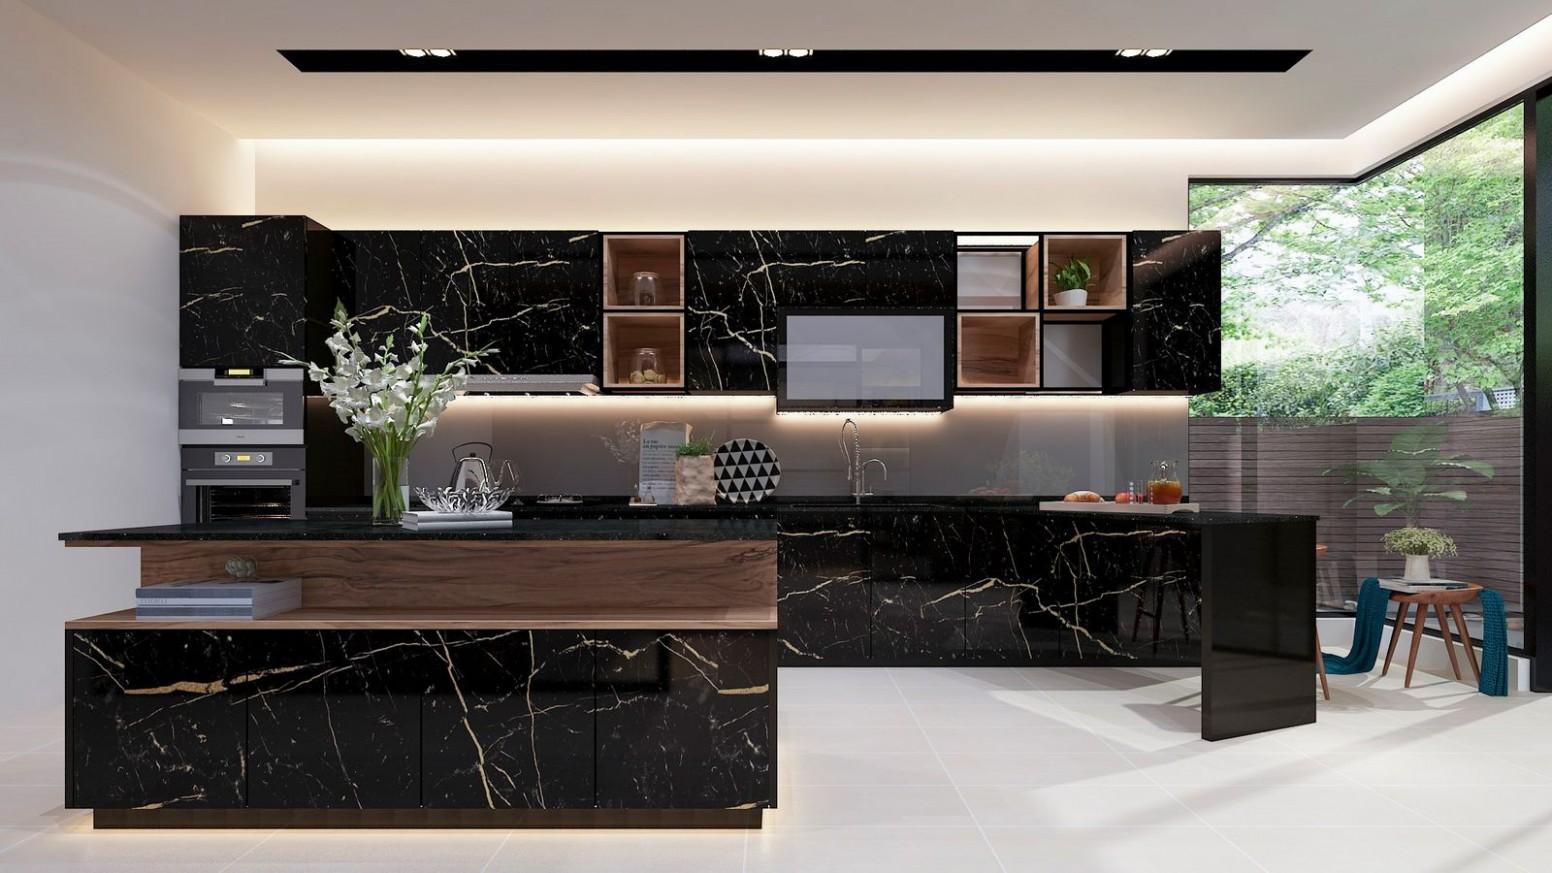 Himmel Kitchen Cabinets - Ampquartz - Kitchen Cabinet Specialist Singapore